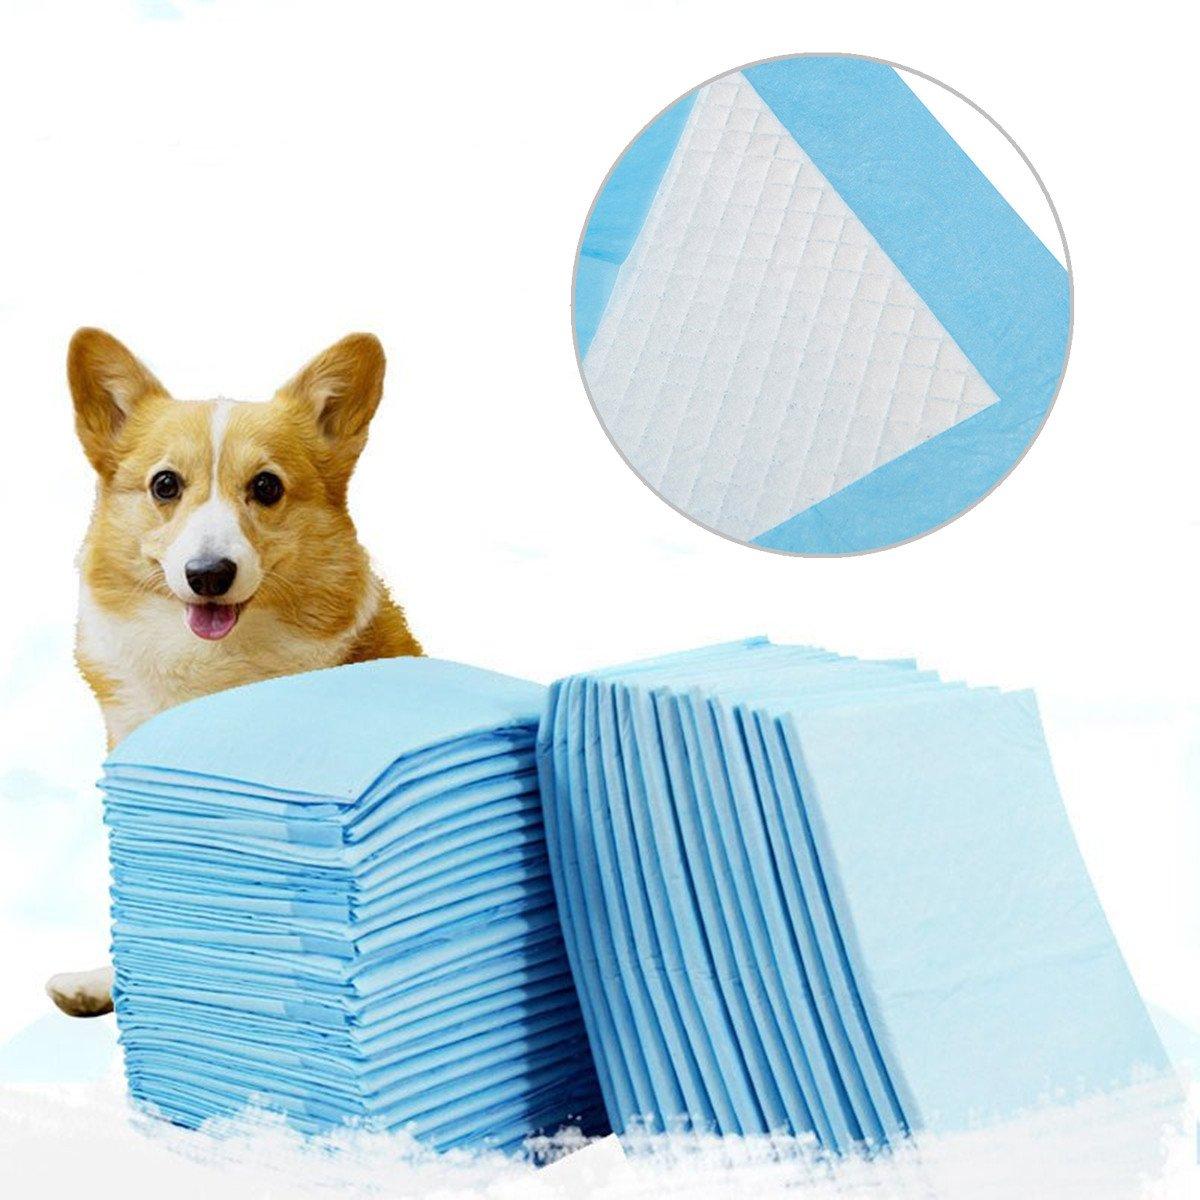 Global Brands Online Pet Training Puppy Pads Super Absorbent Pads Pet Training Puppy Pads Pet Supplies